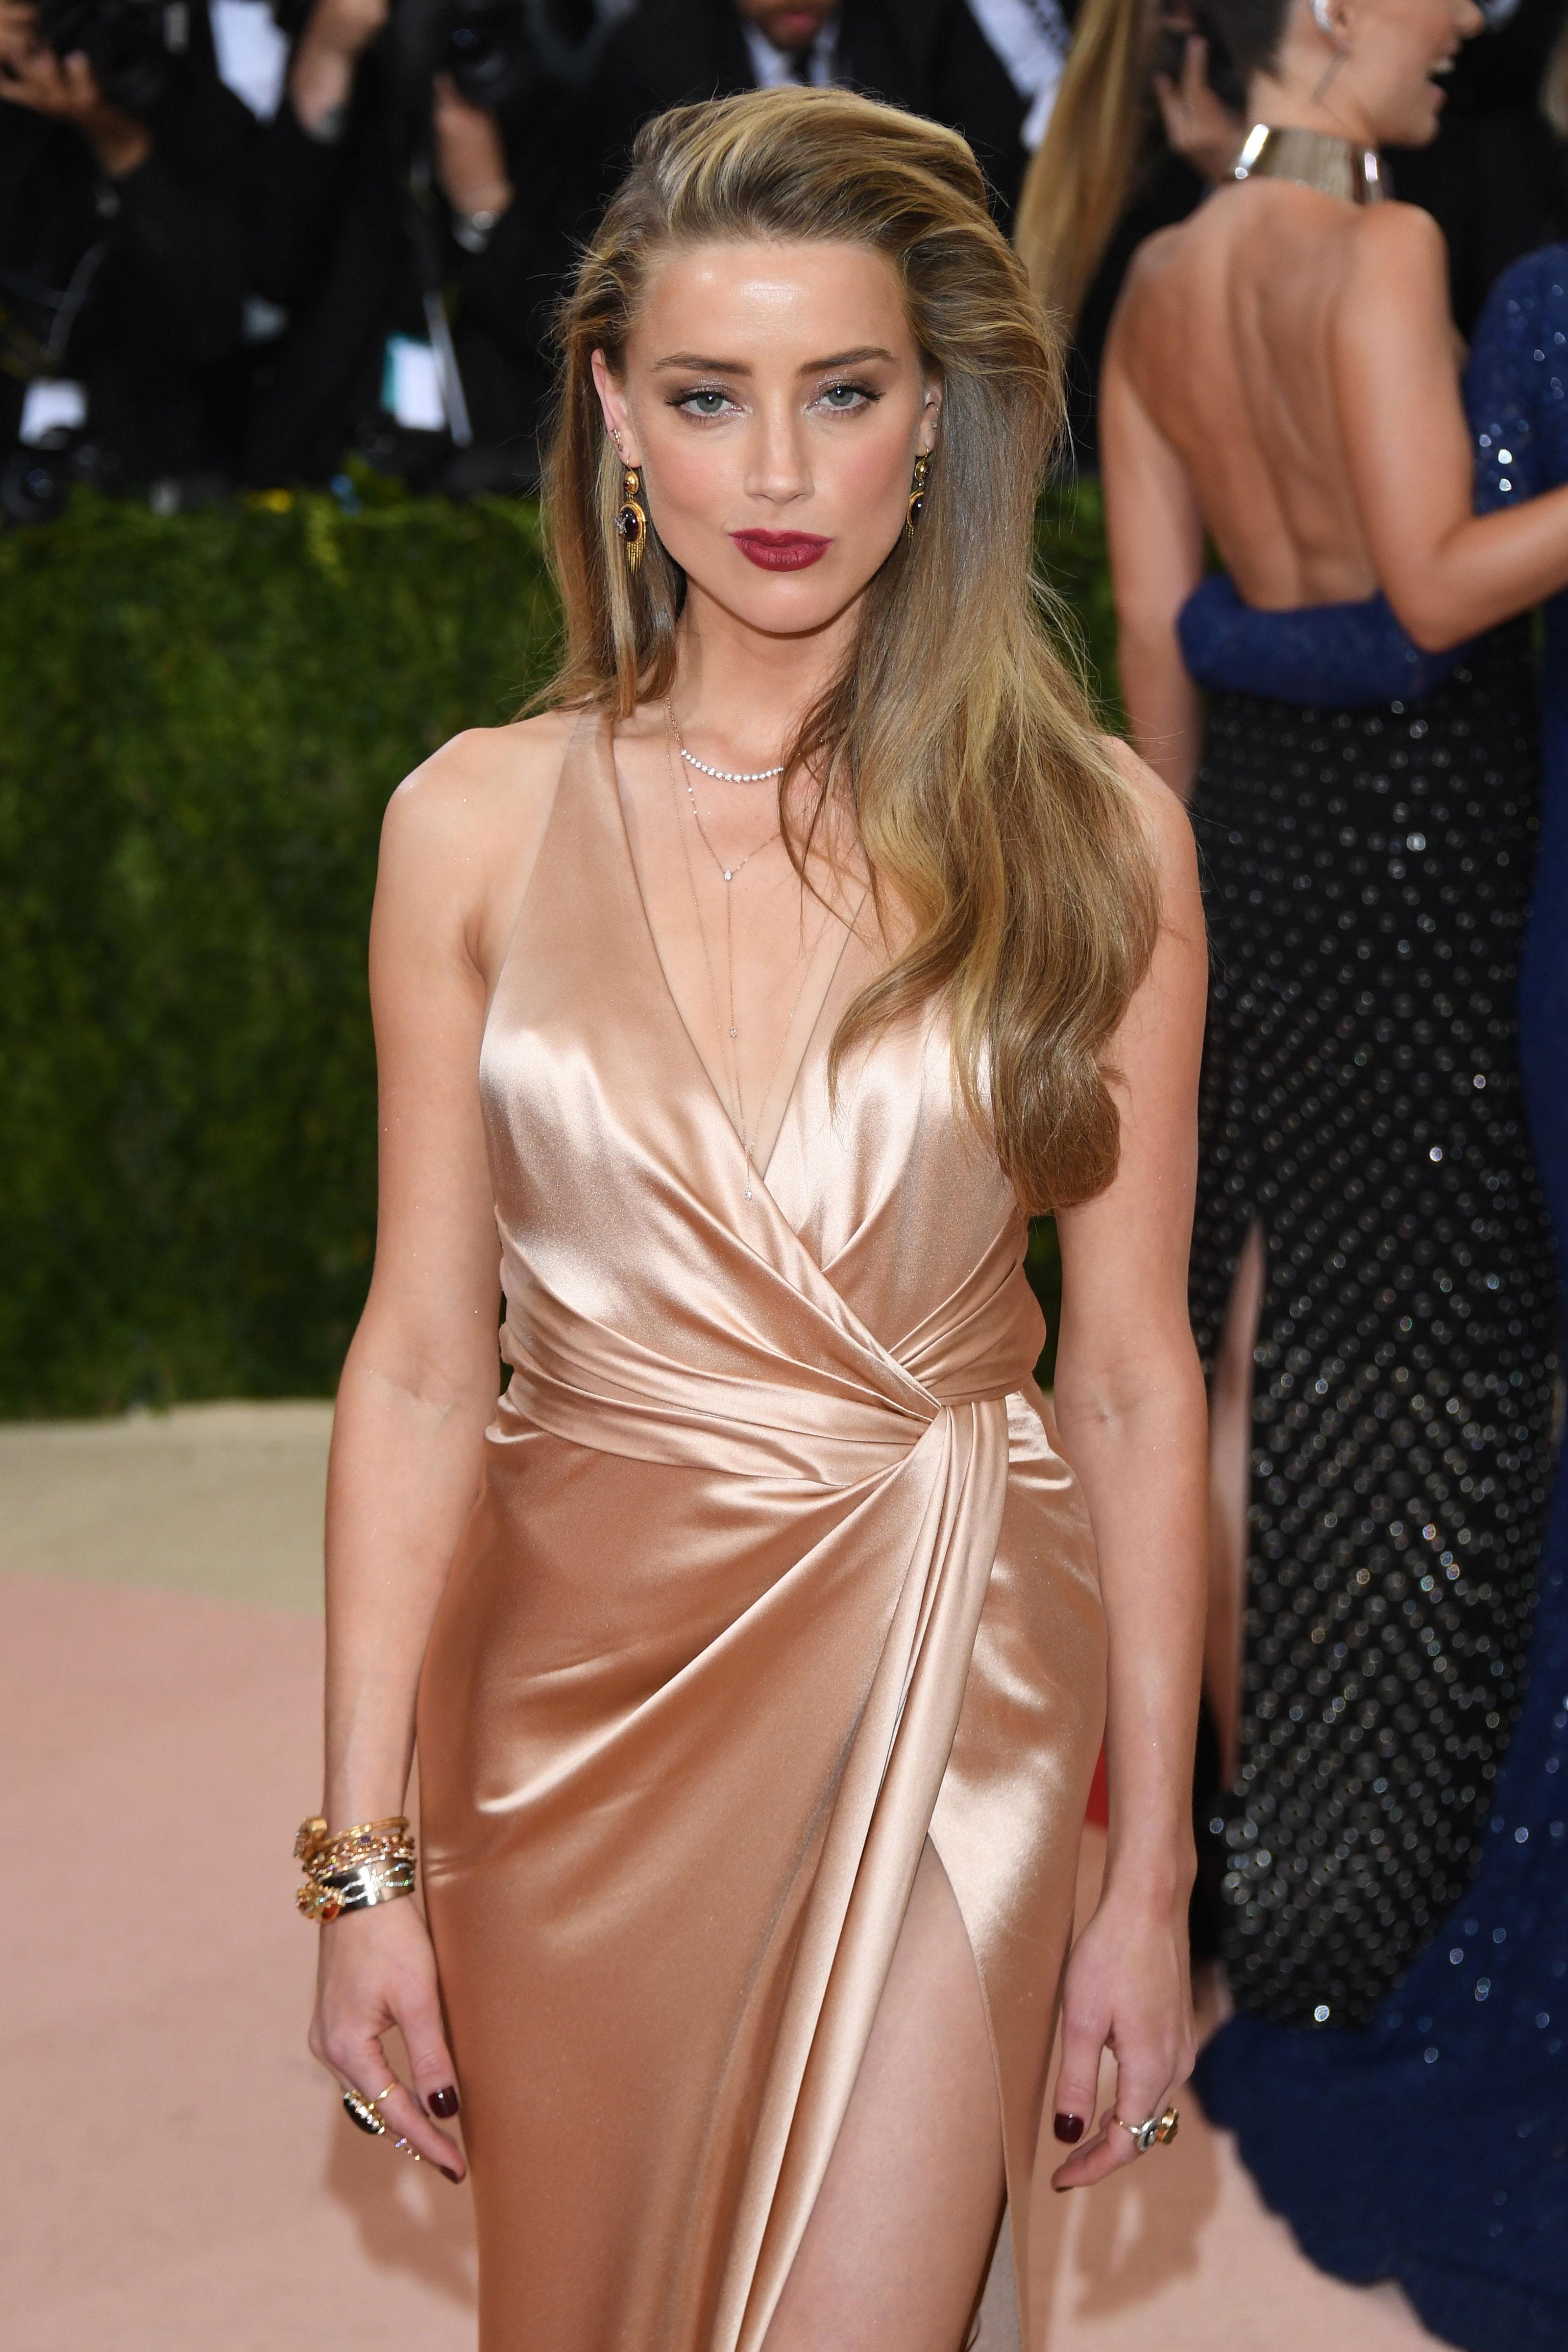 Amber Heard 2016 Costume Institute Gala 3 - Satiny Amber Heard